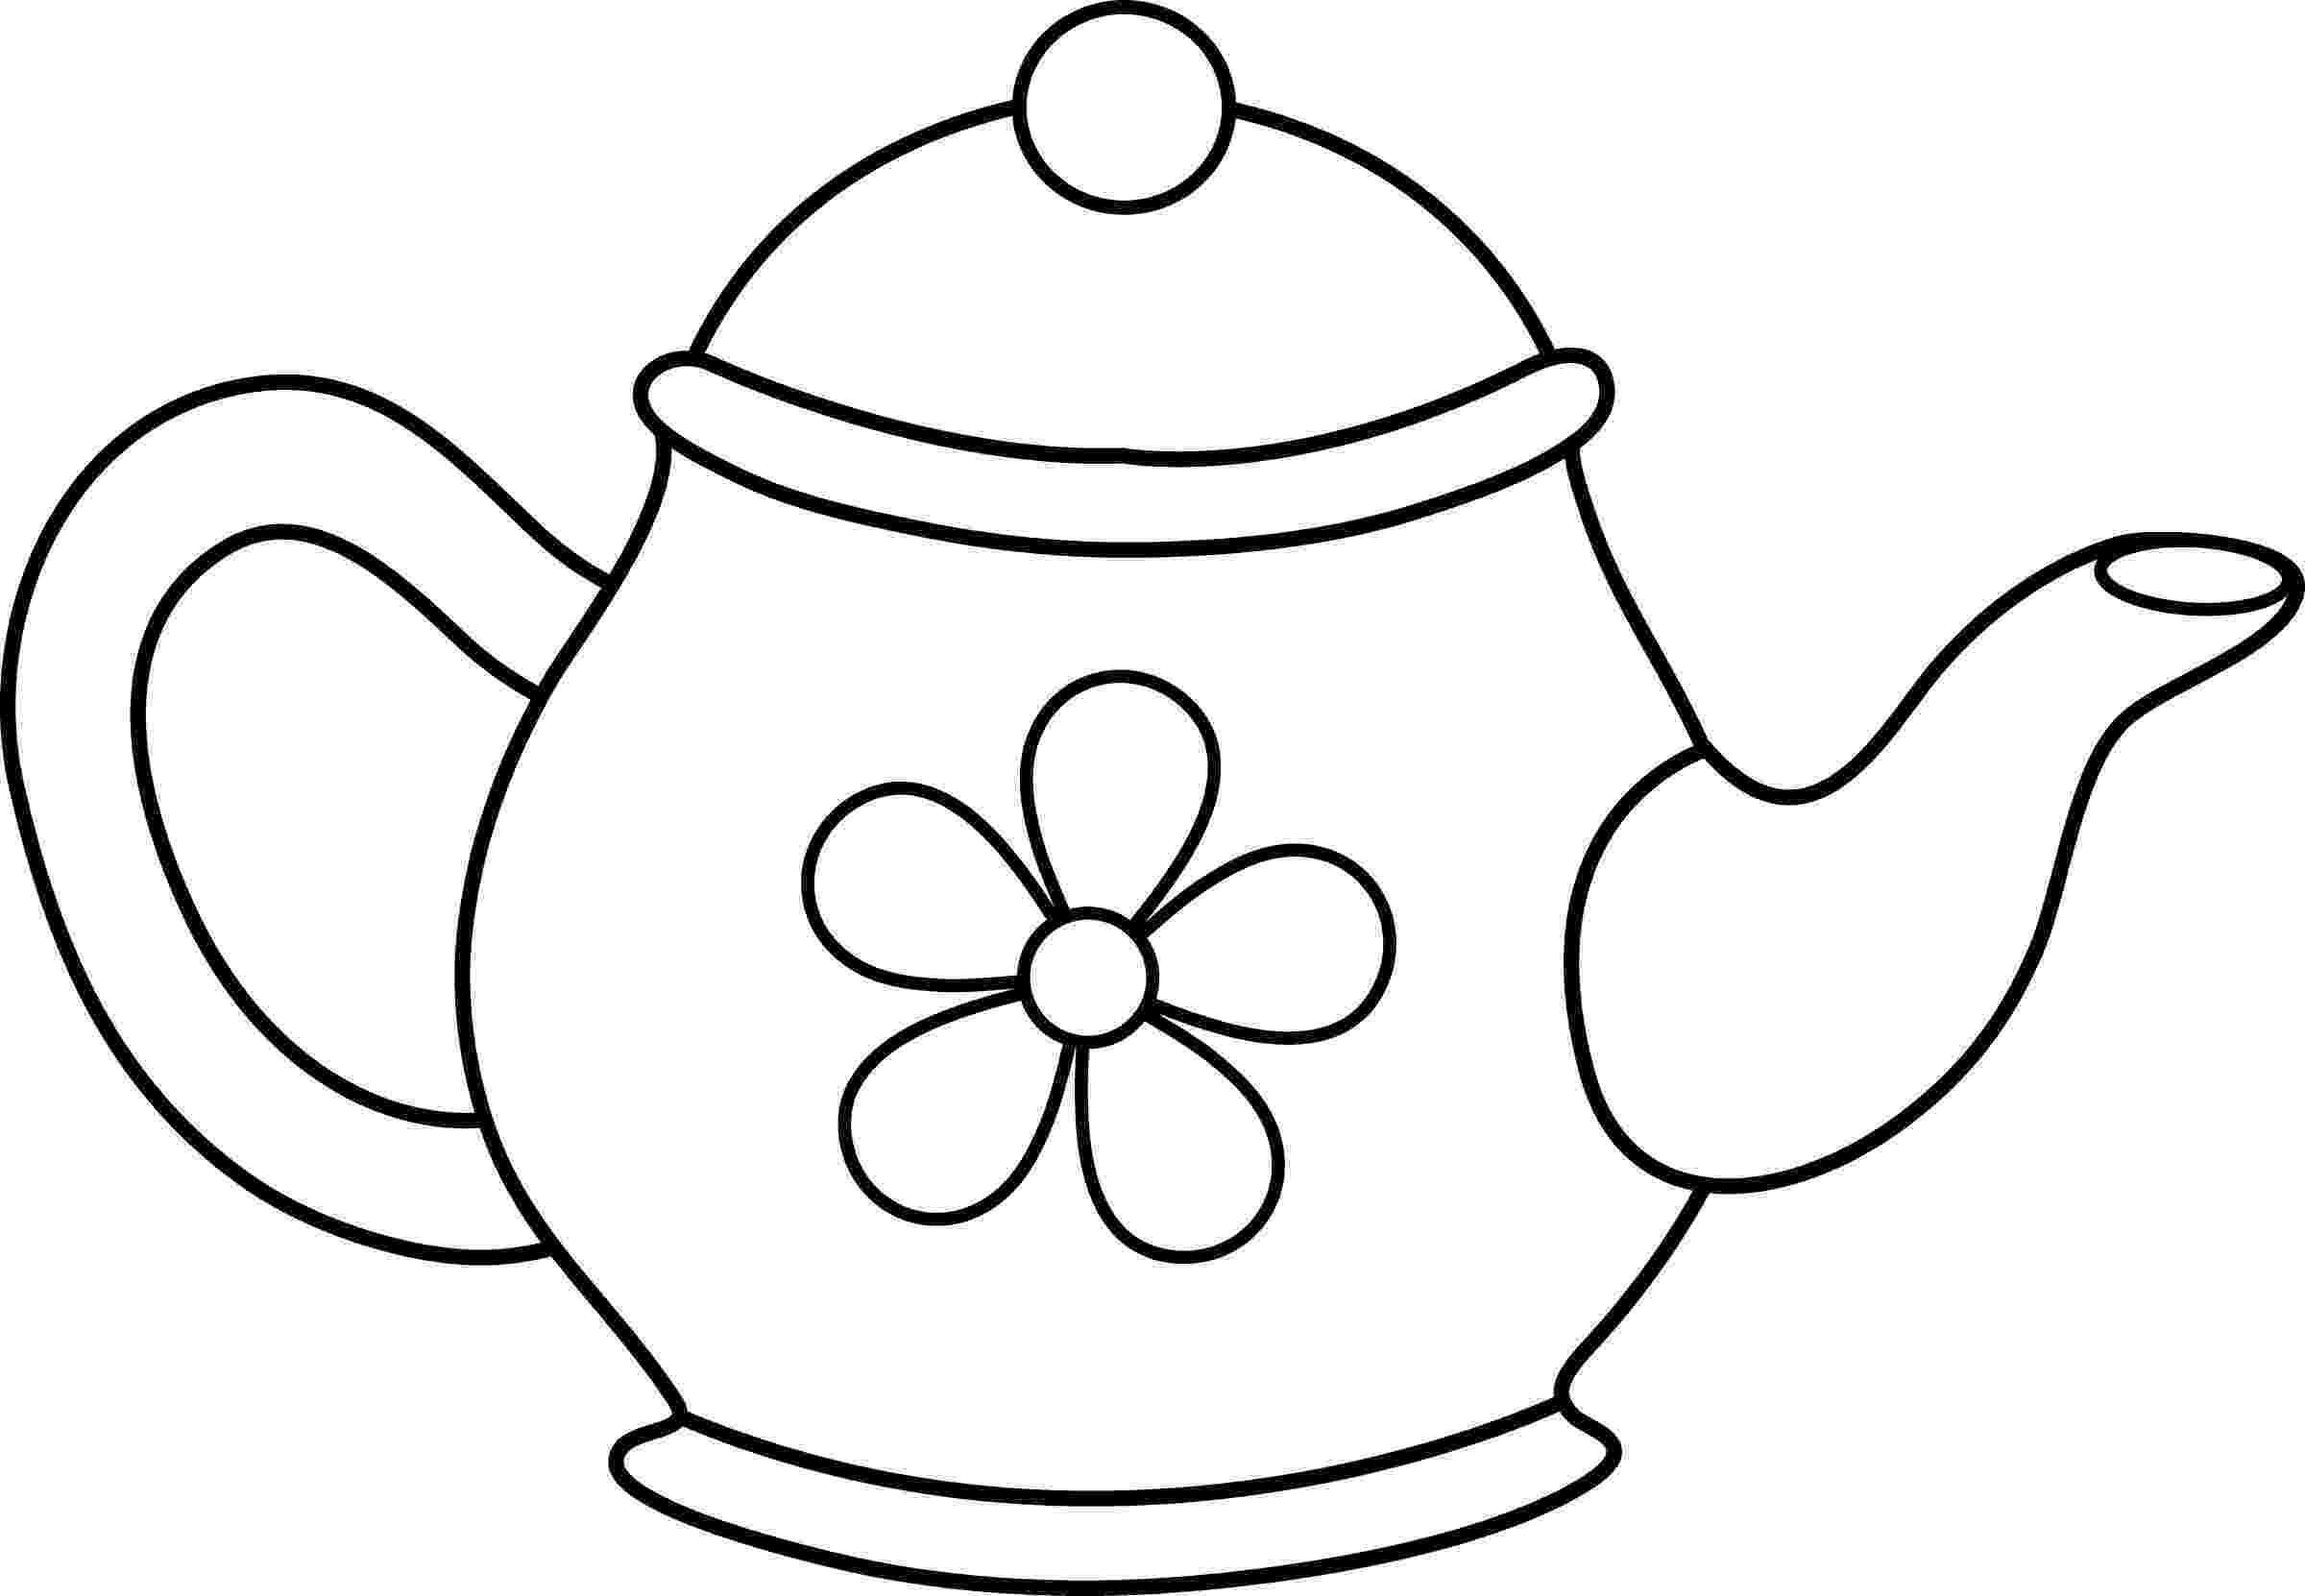 teapot colouring printable teapot coloring pages coloring home colouring teapot